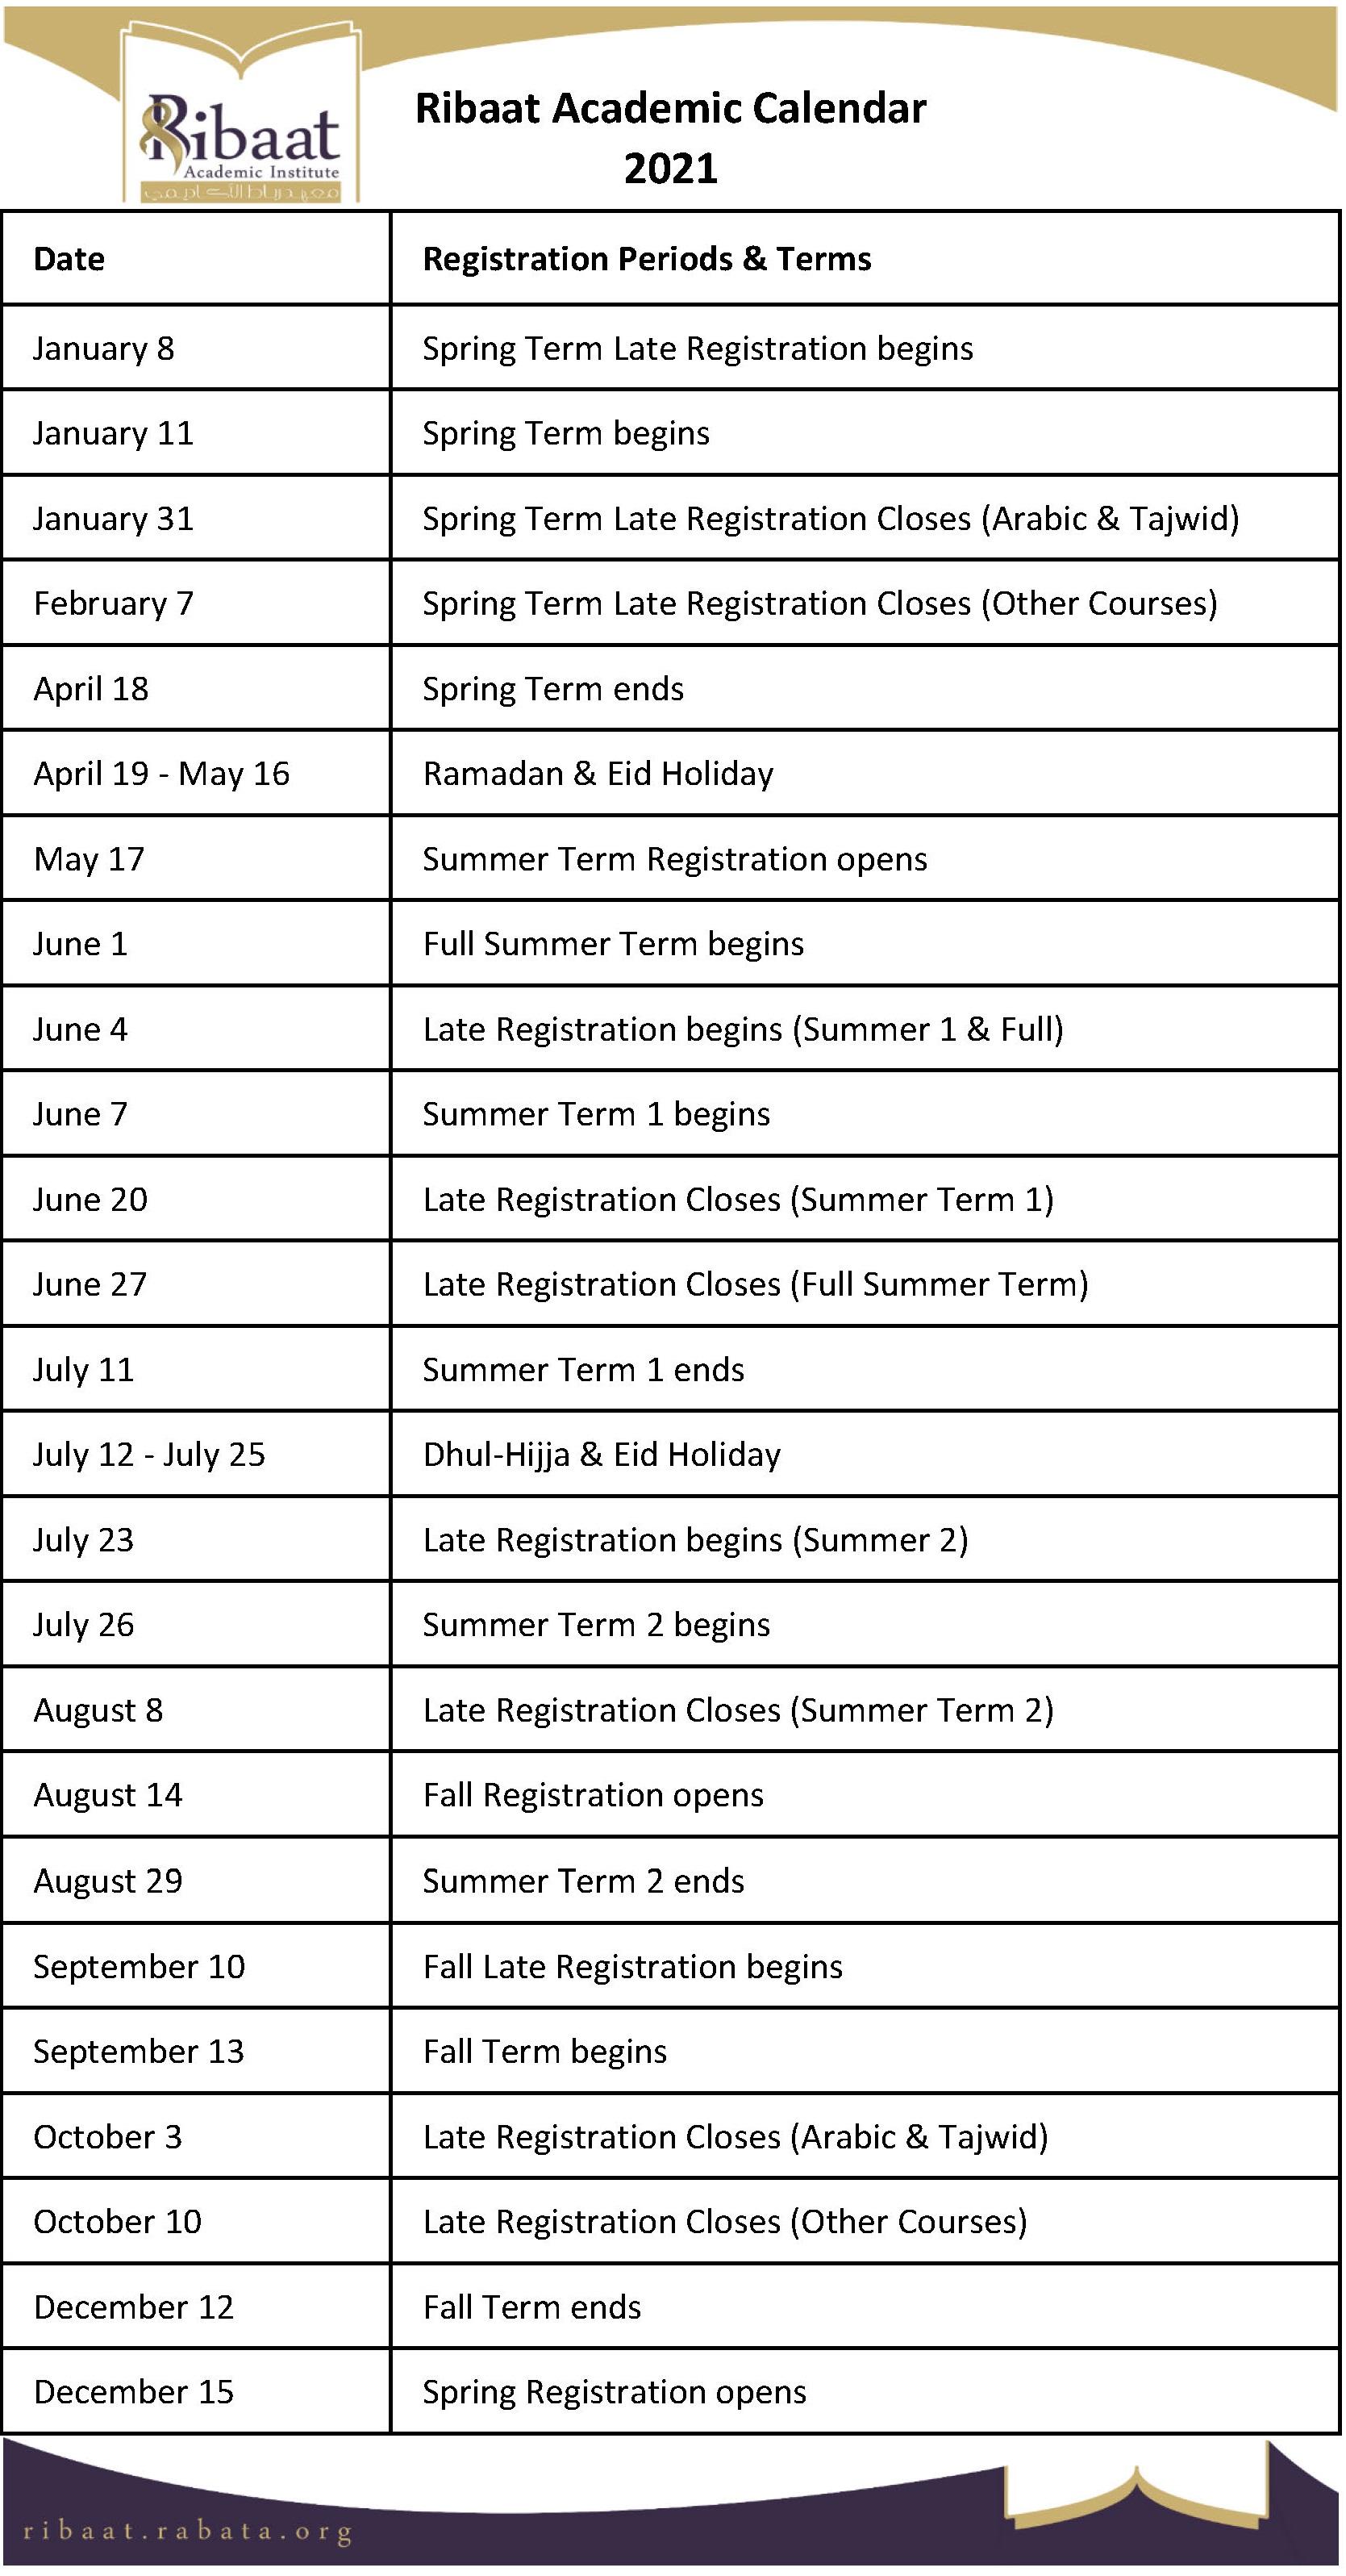 Ribaat Academic Calendar